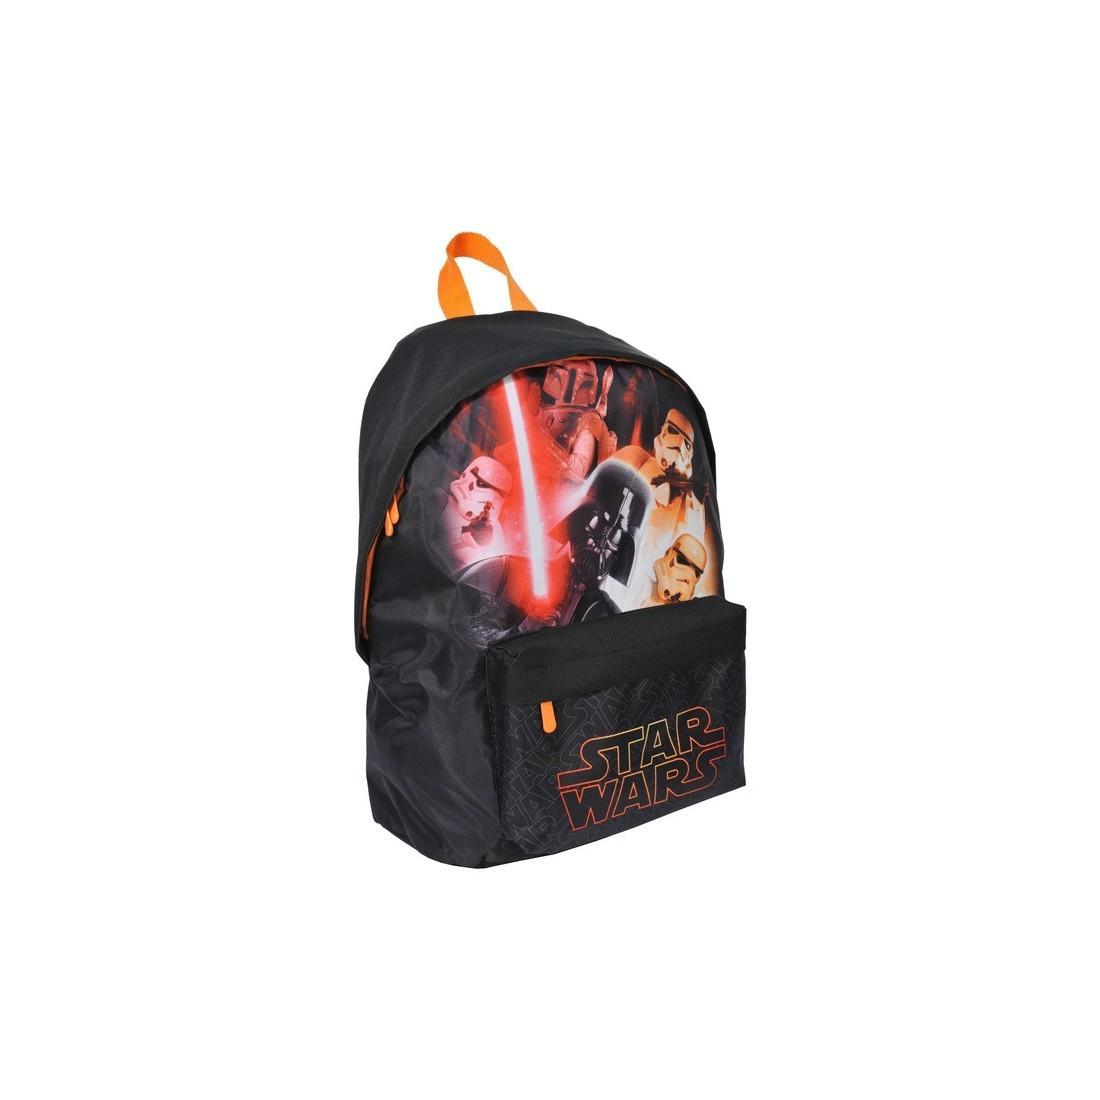 Plecak Star Wars czarny